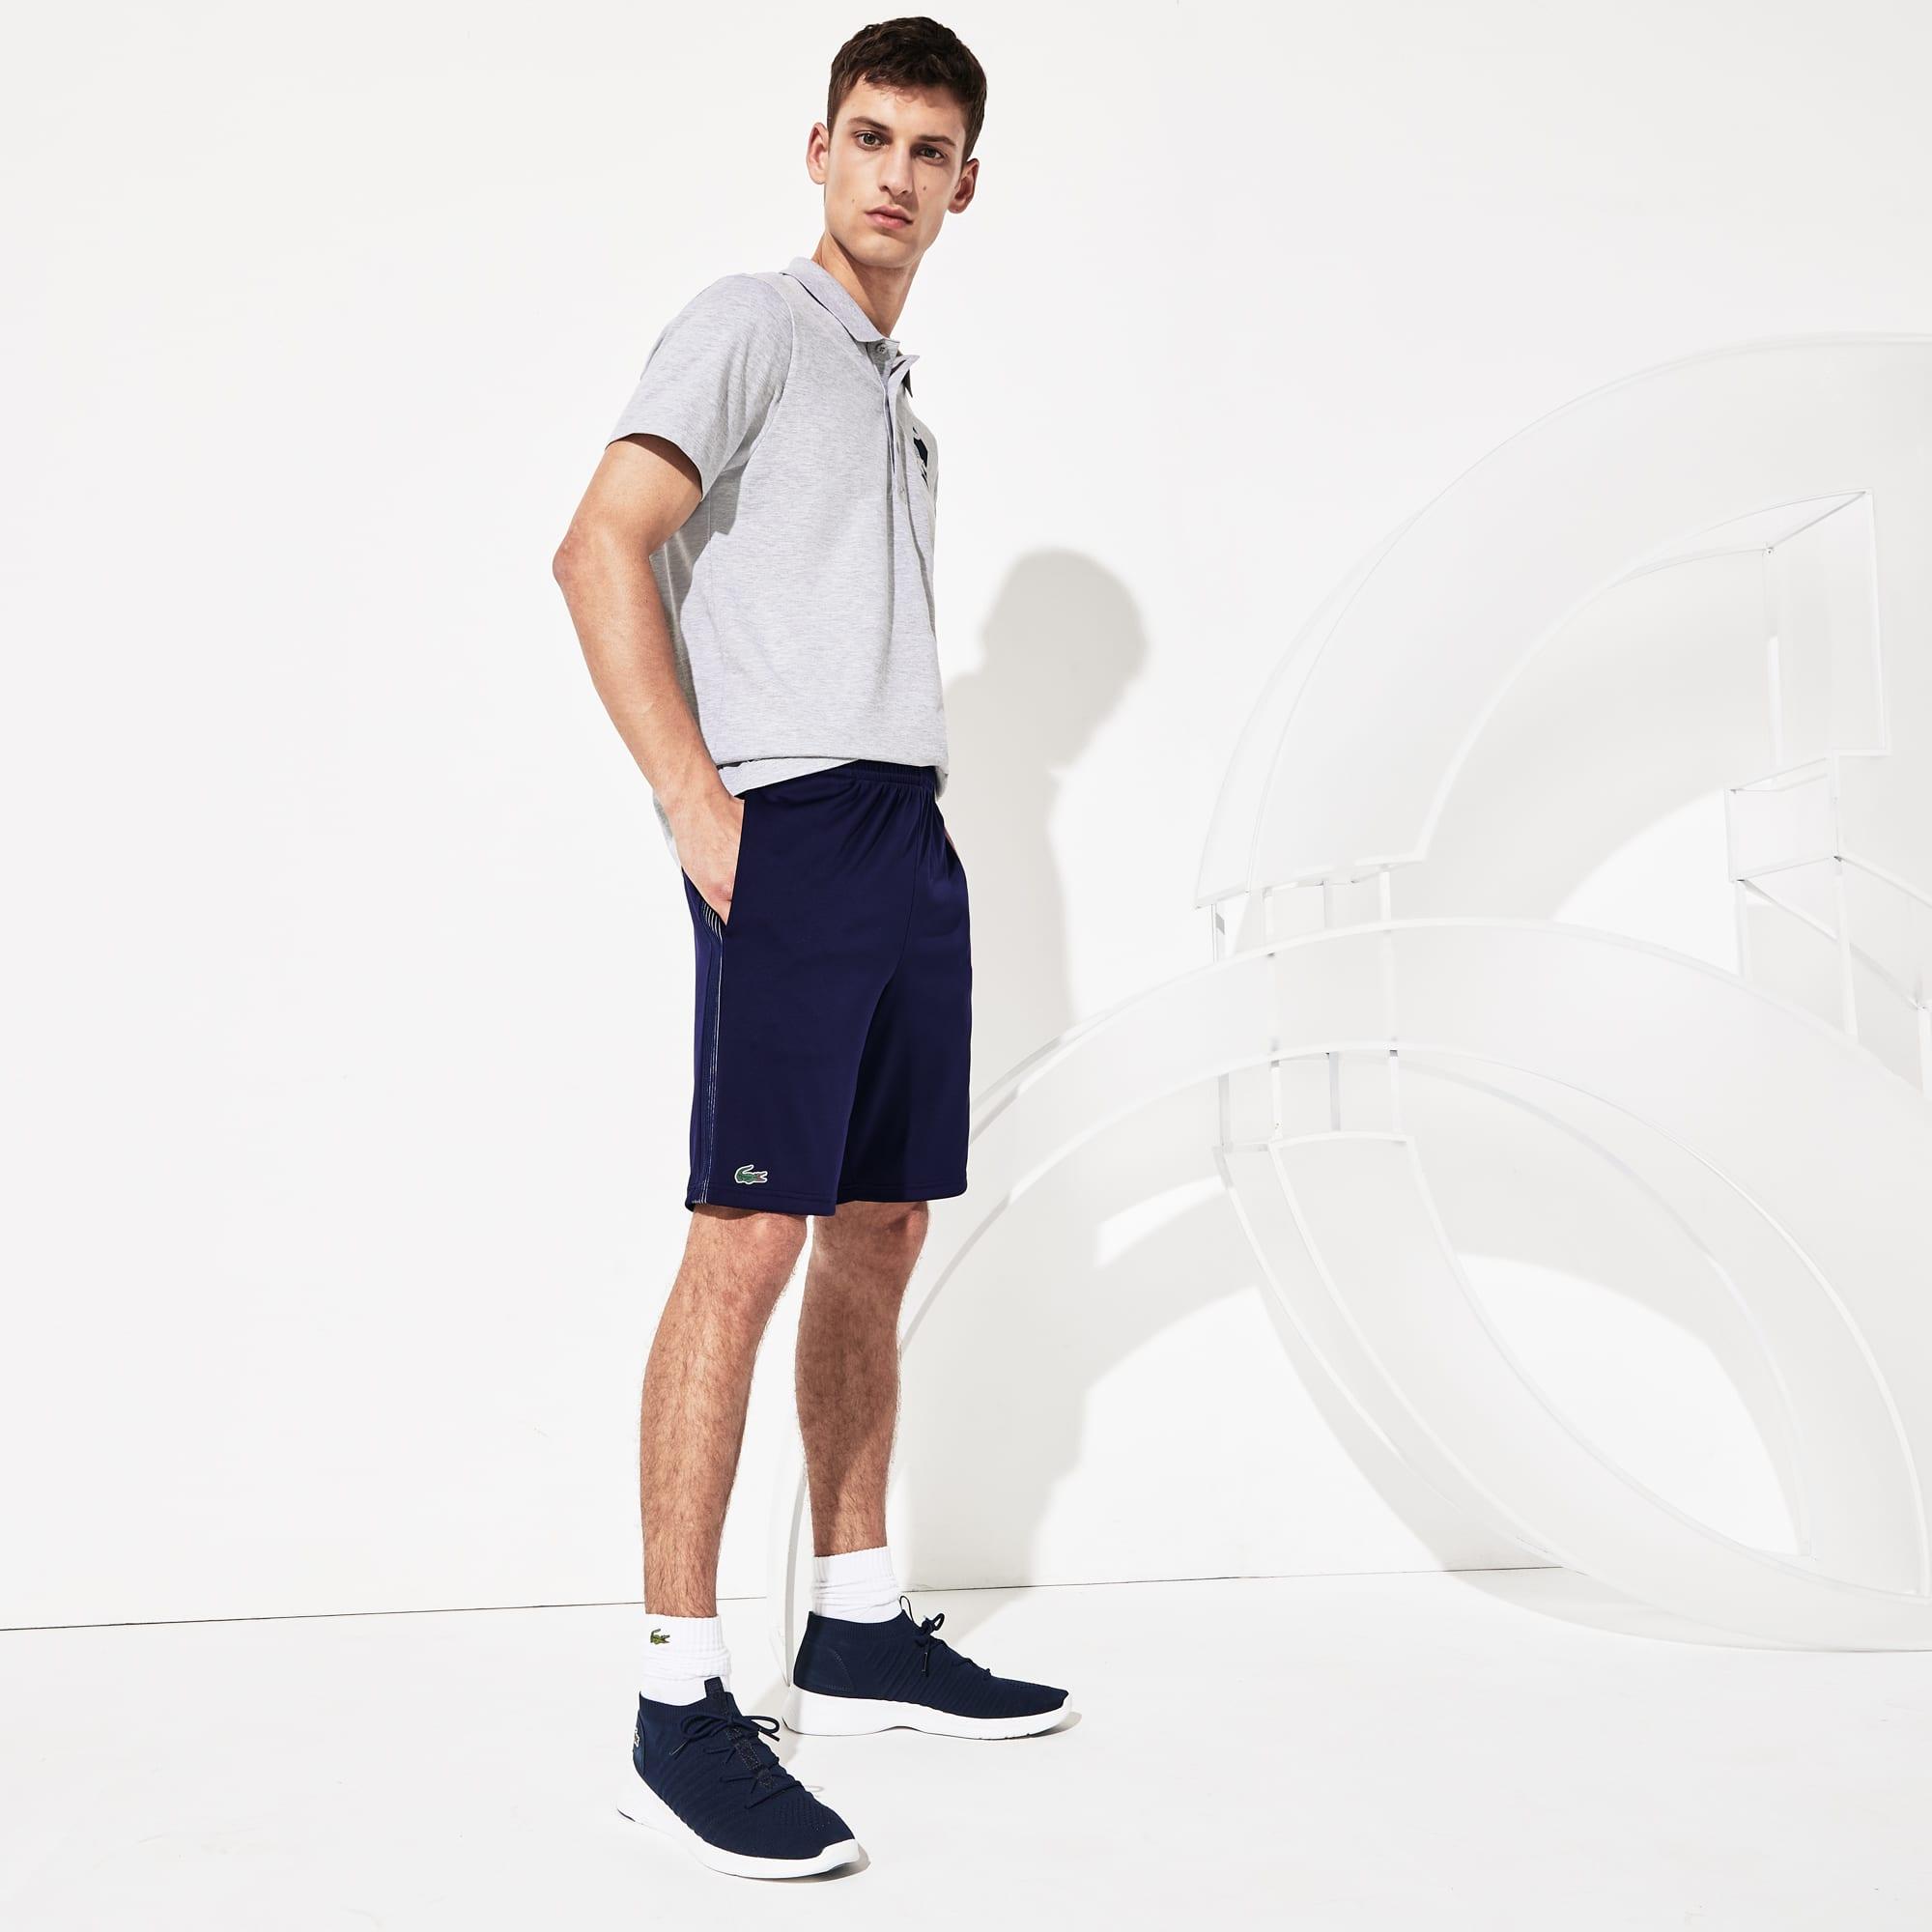 Lacoste SPORT Novak Djokovic Support With Style - Off Court Collection-short heren technisch piqué